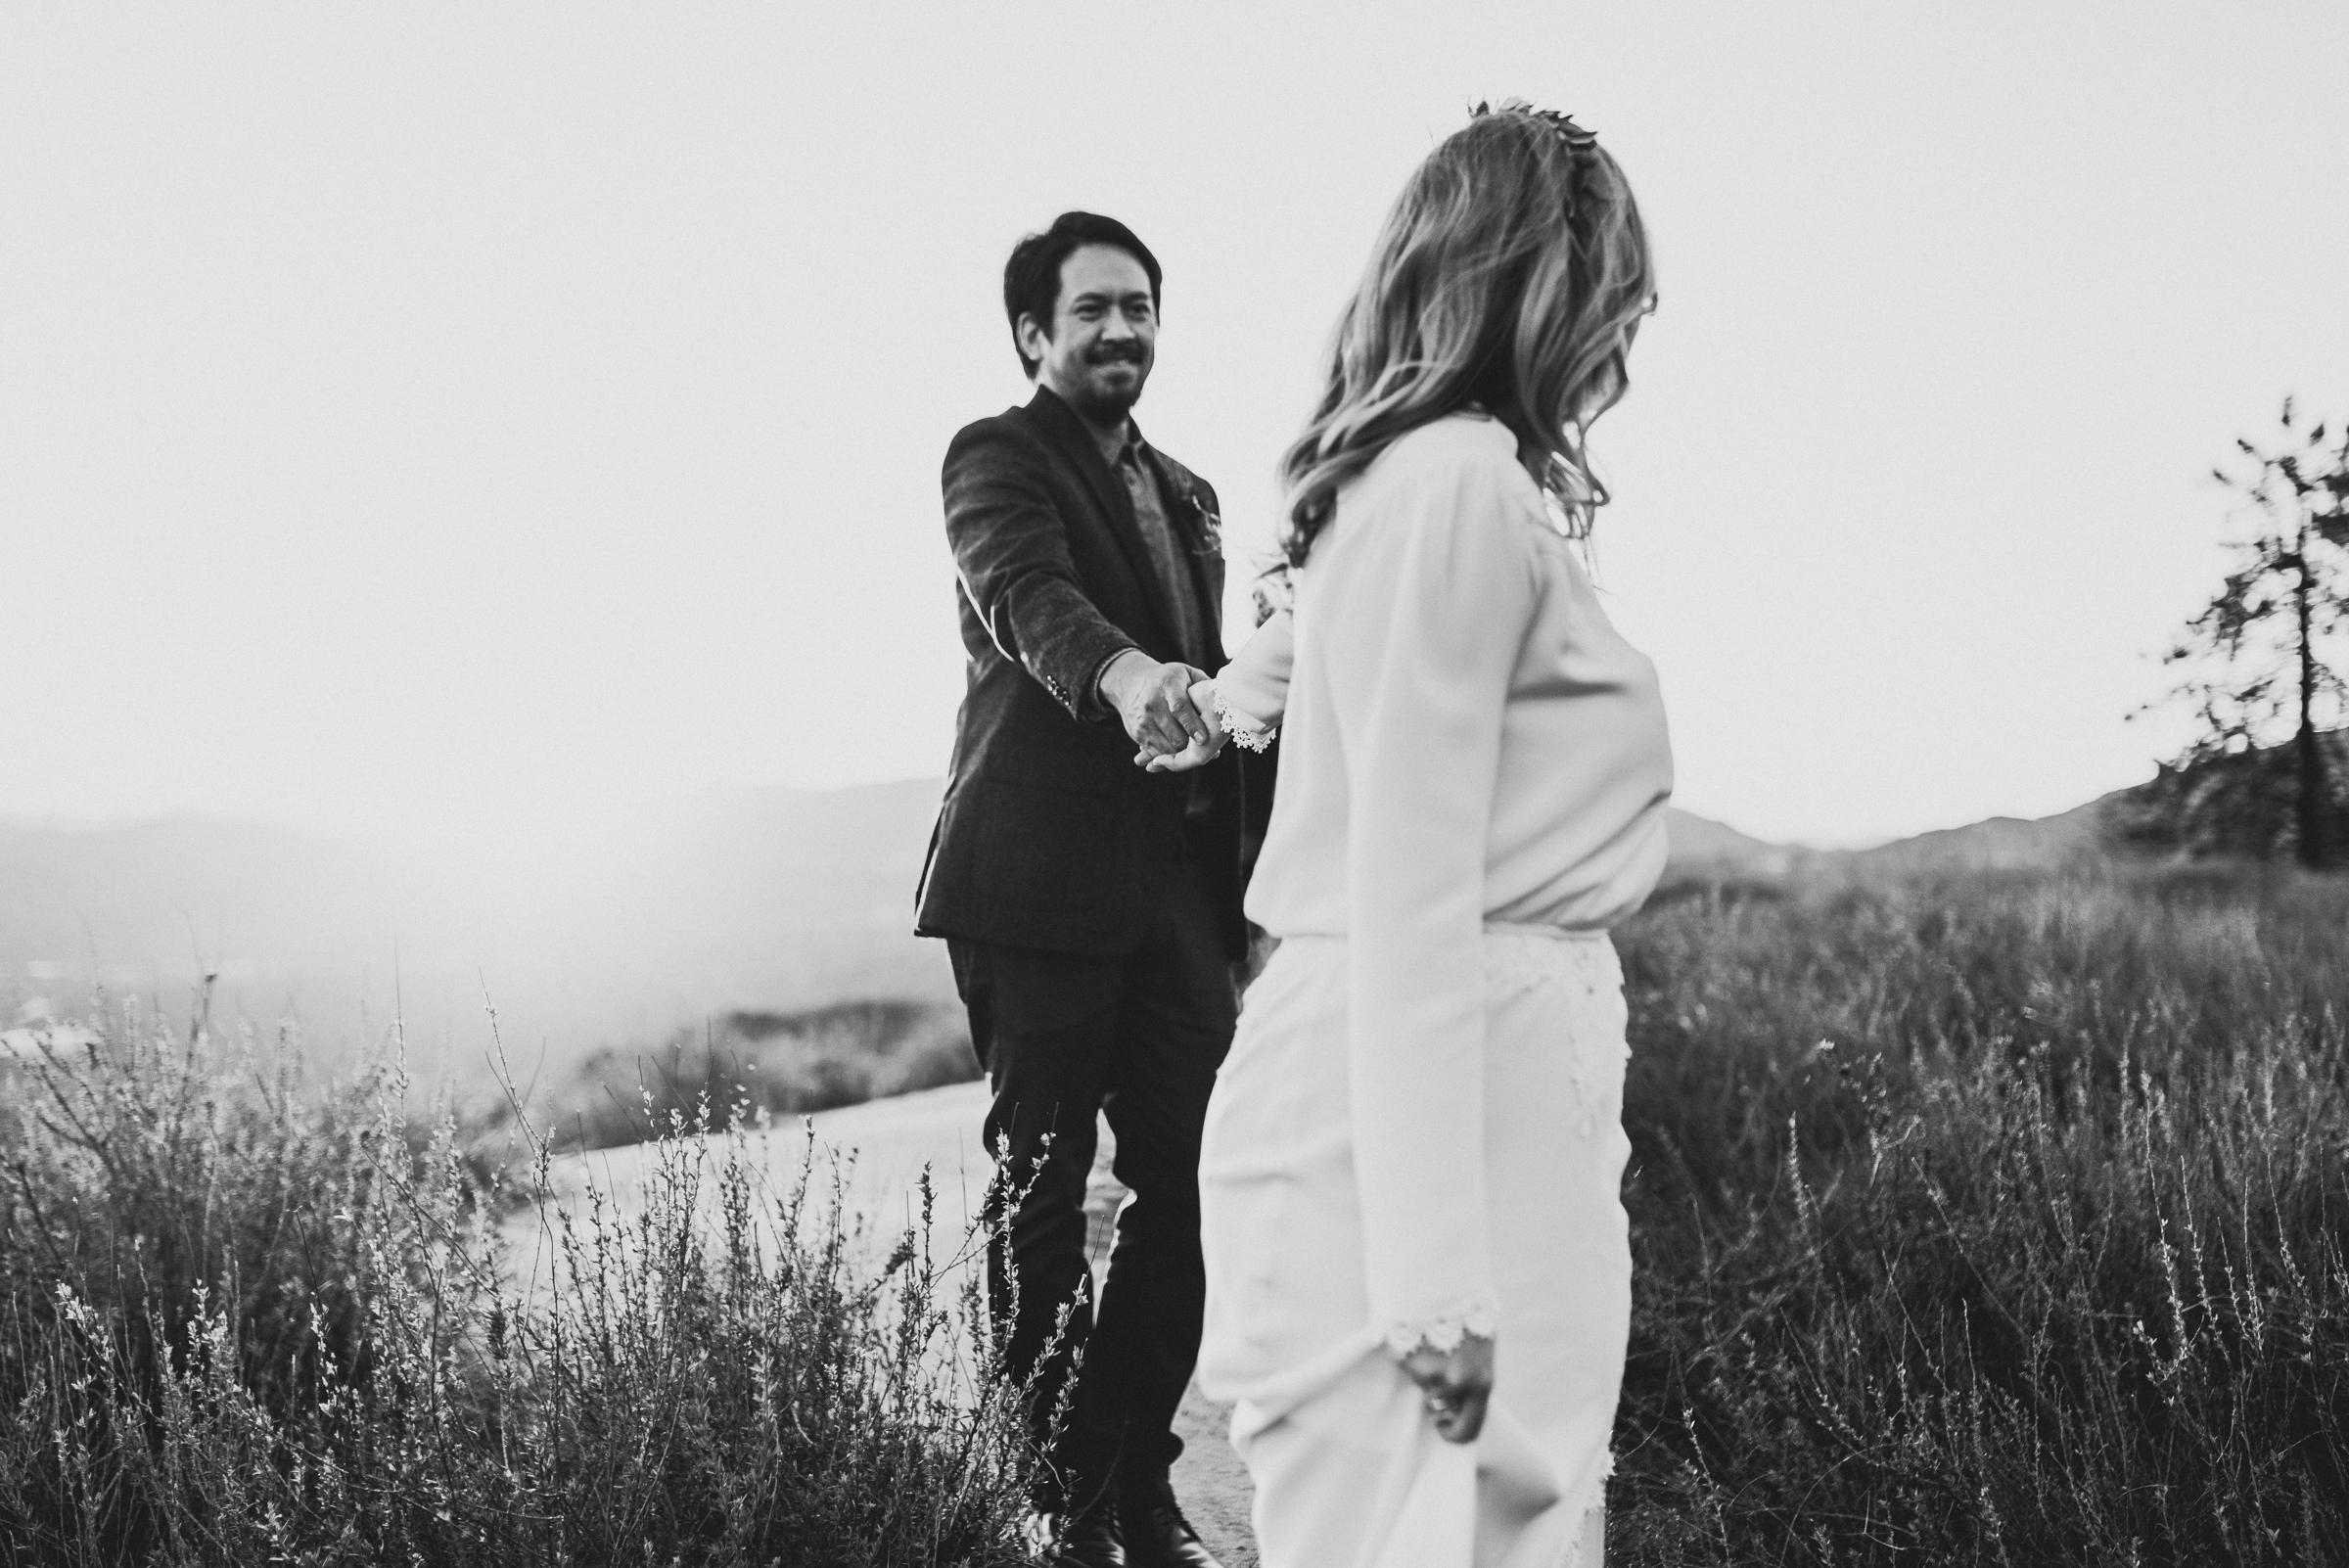 ©Isaiah + Taylor Photography - Intimate Elopement, Eaton Canyon, Los Angeles Wedding Photographer-106.jpg